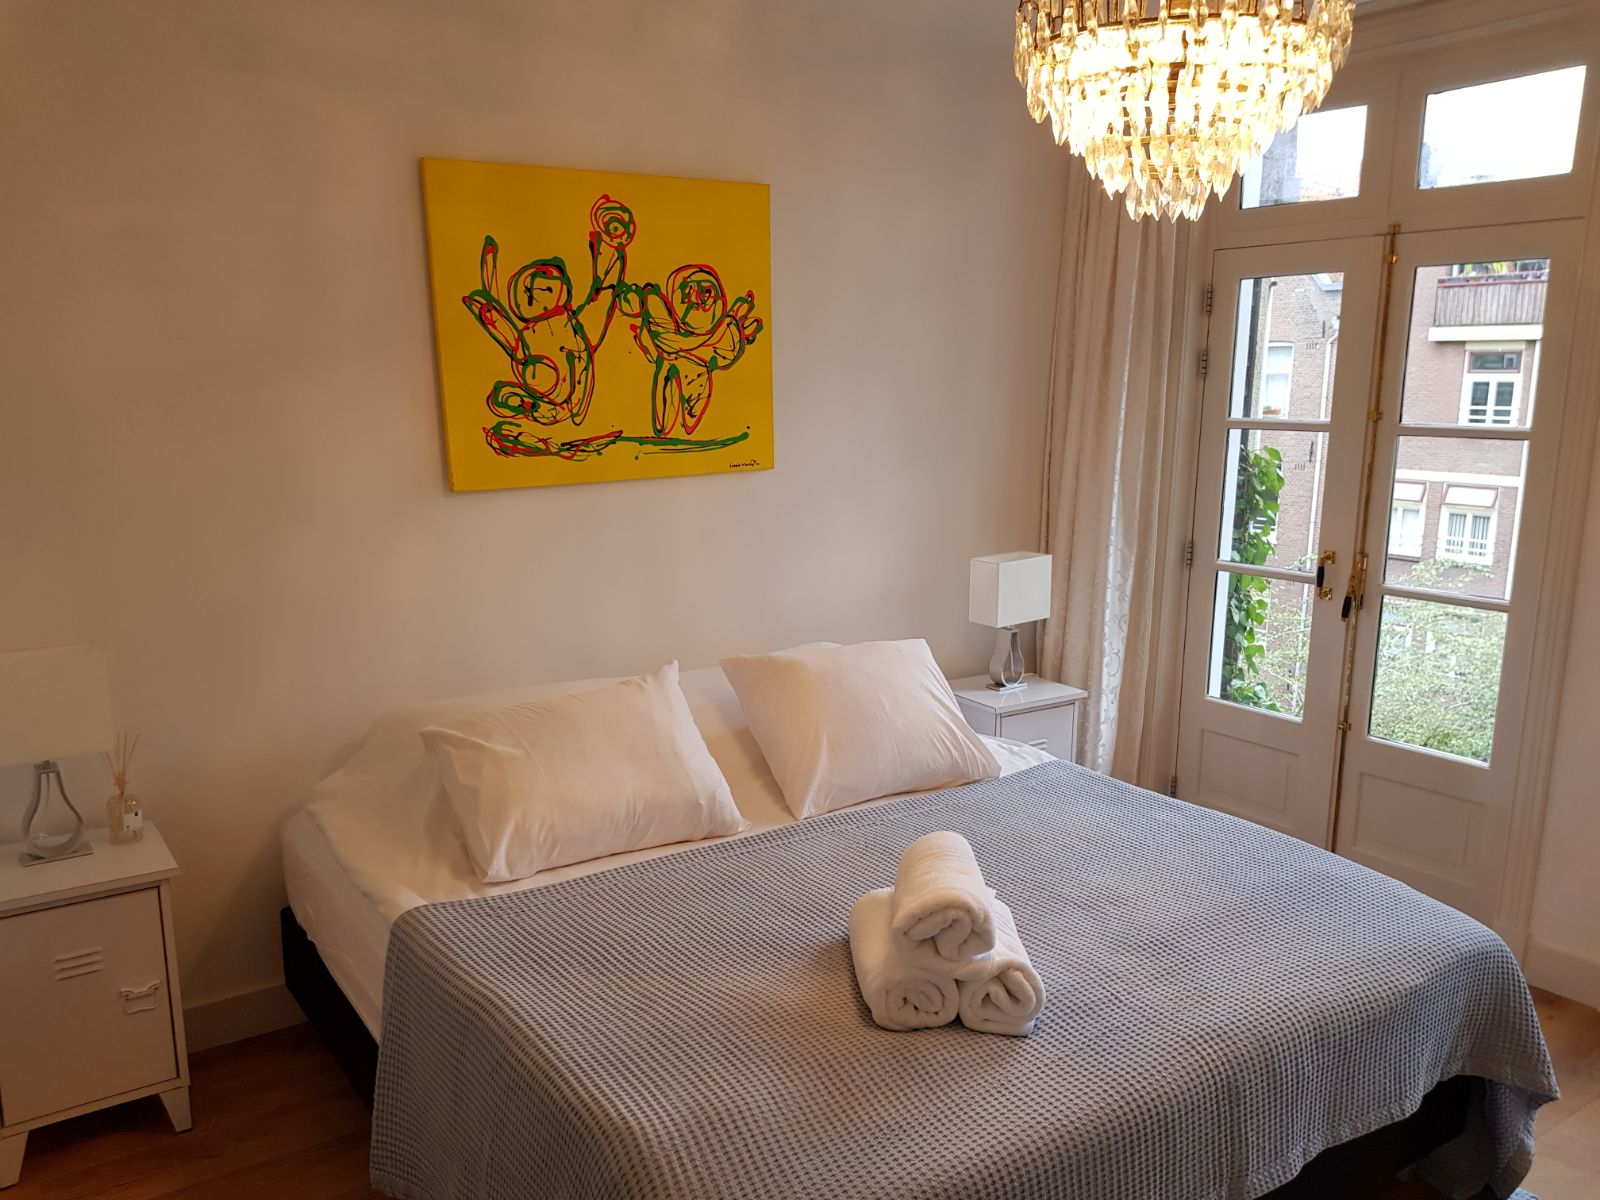 Bedroom at 21 Haarlemmerplein Apartments, Amsterdam